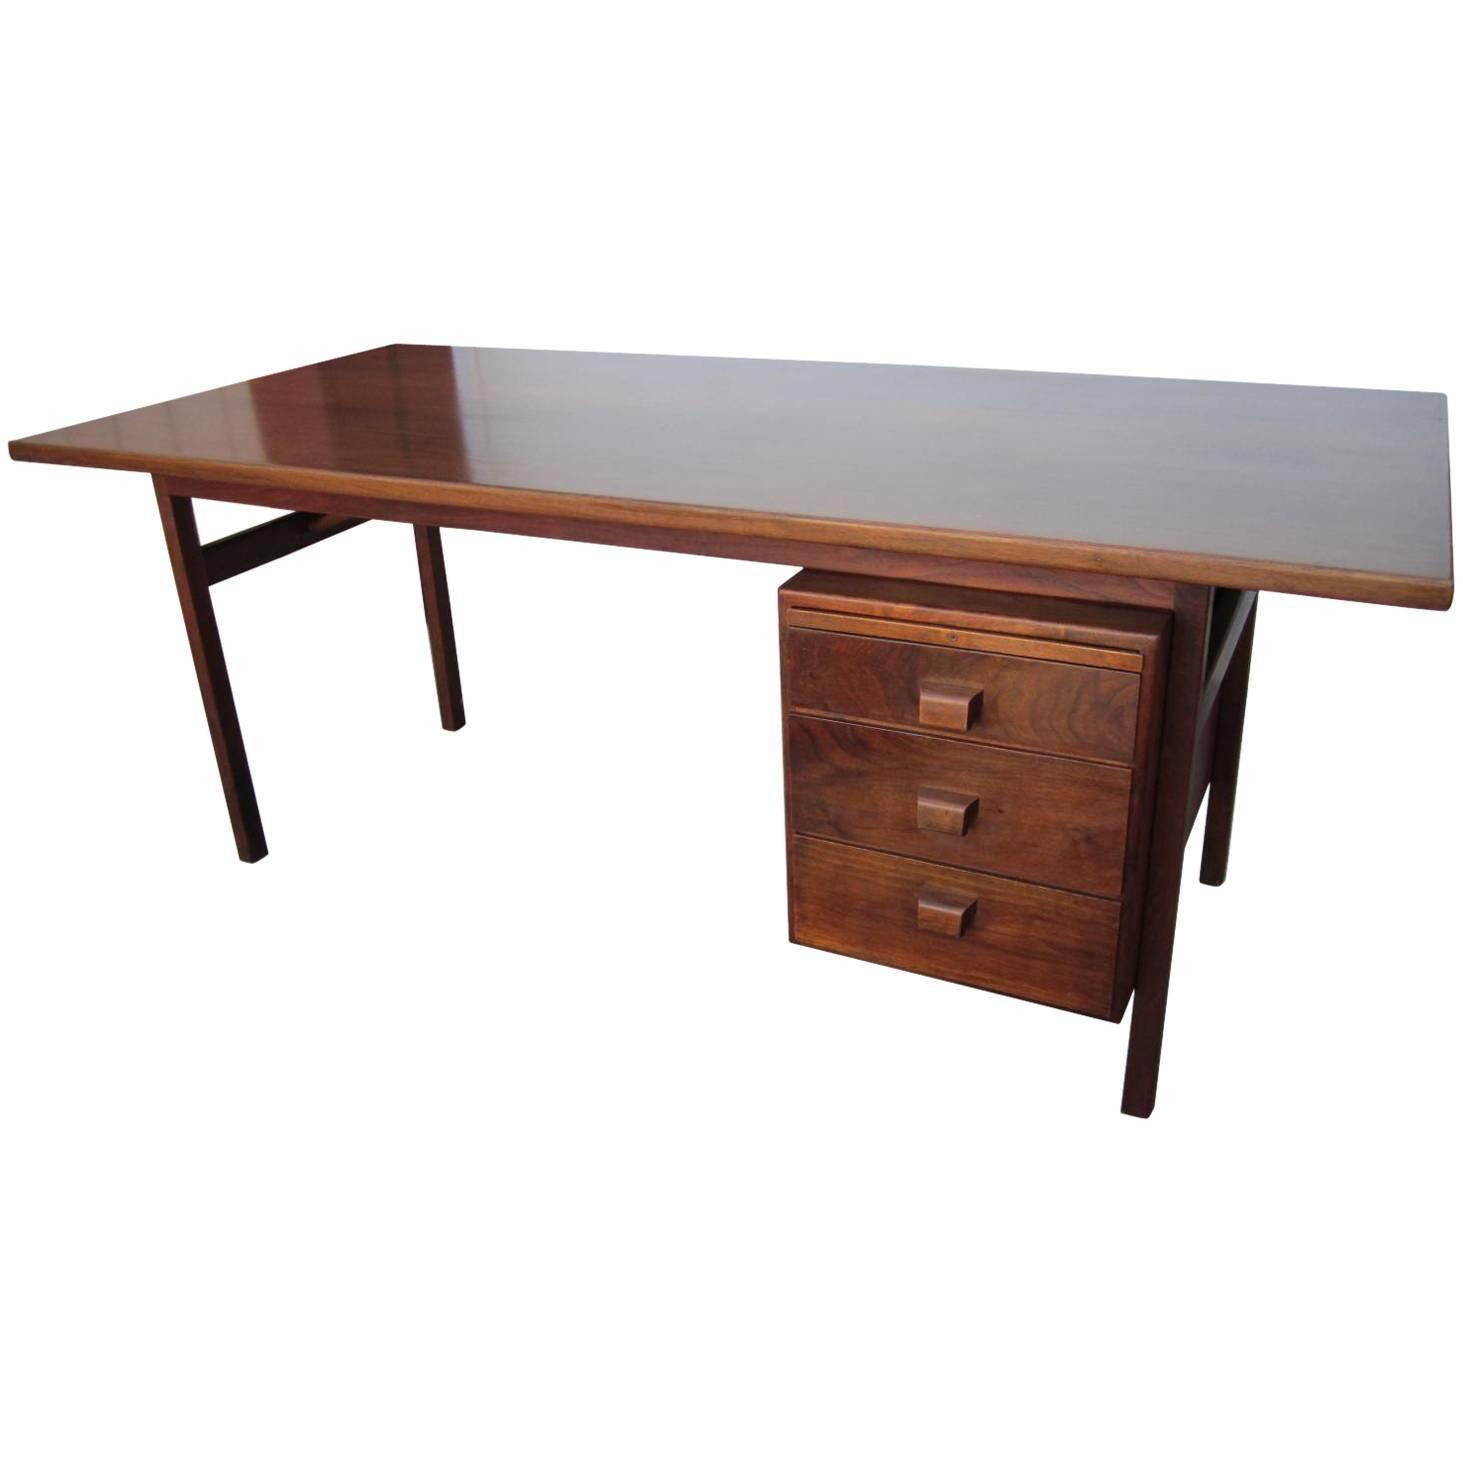 Handsome Jens Risom Walnut Desk, Mid-Century Modern